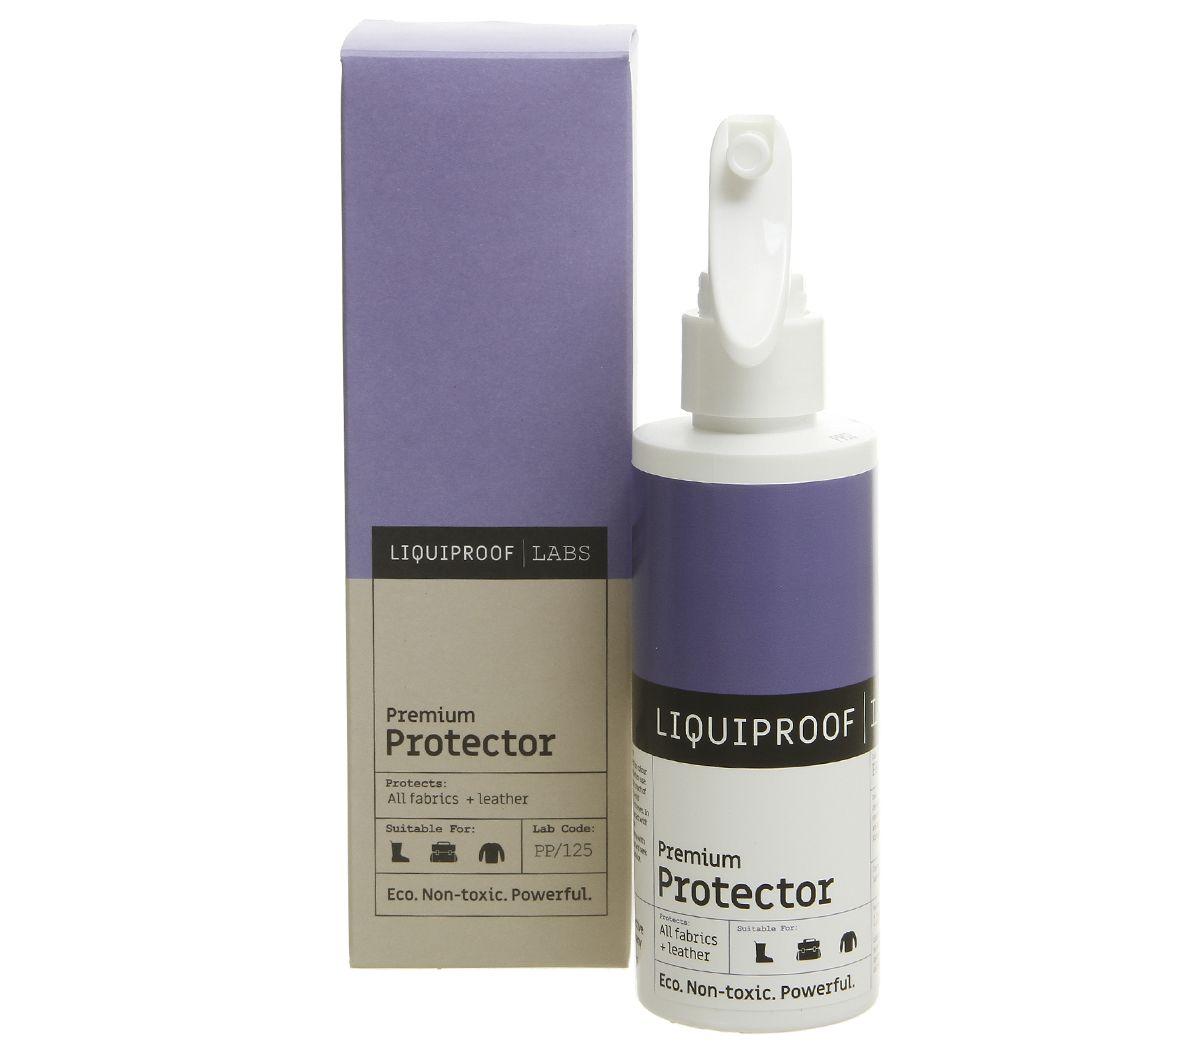 Liquiproof Protector 125ml